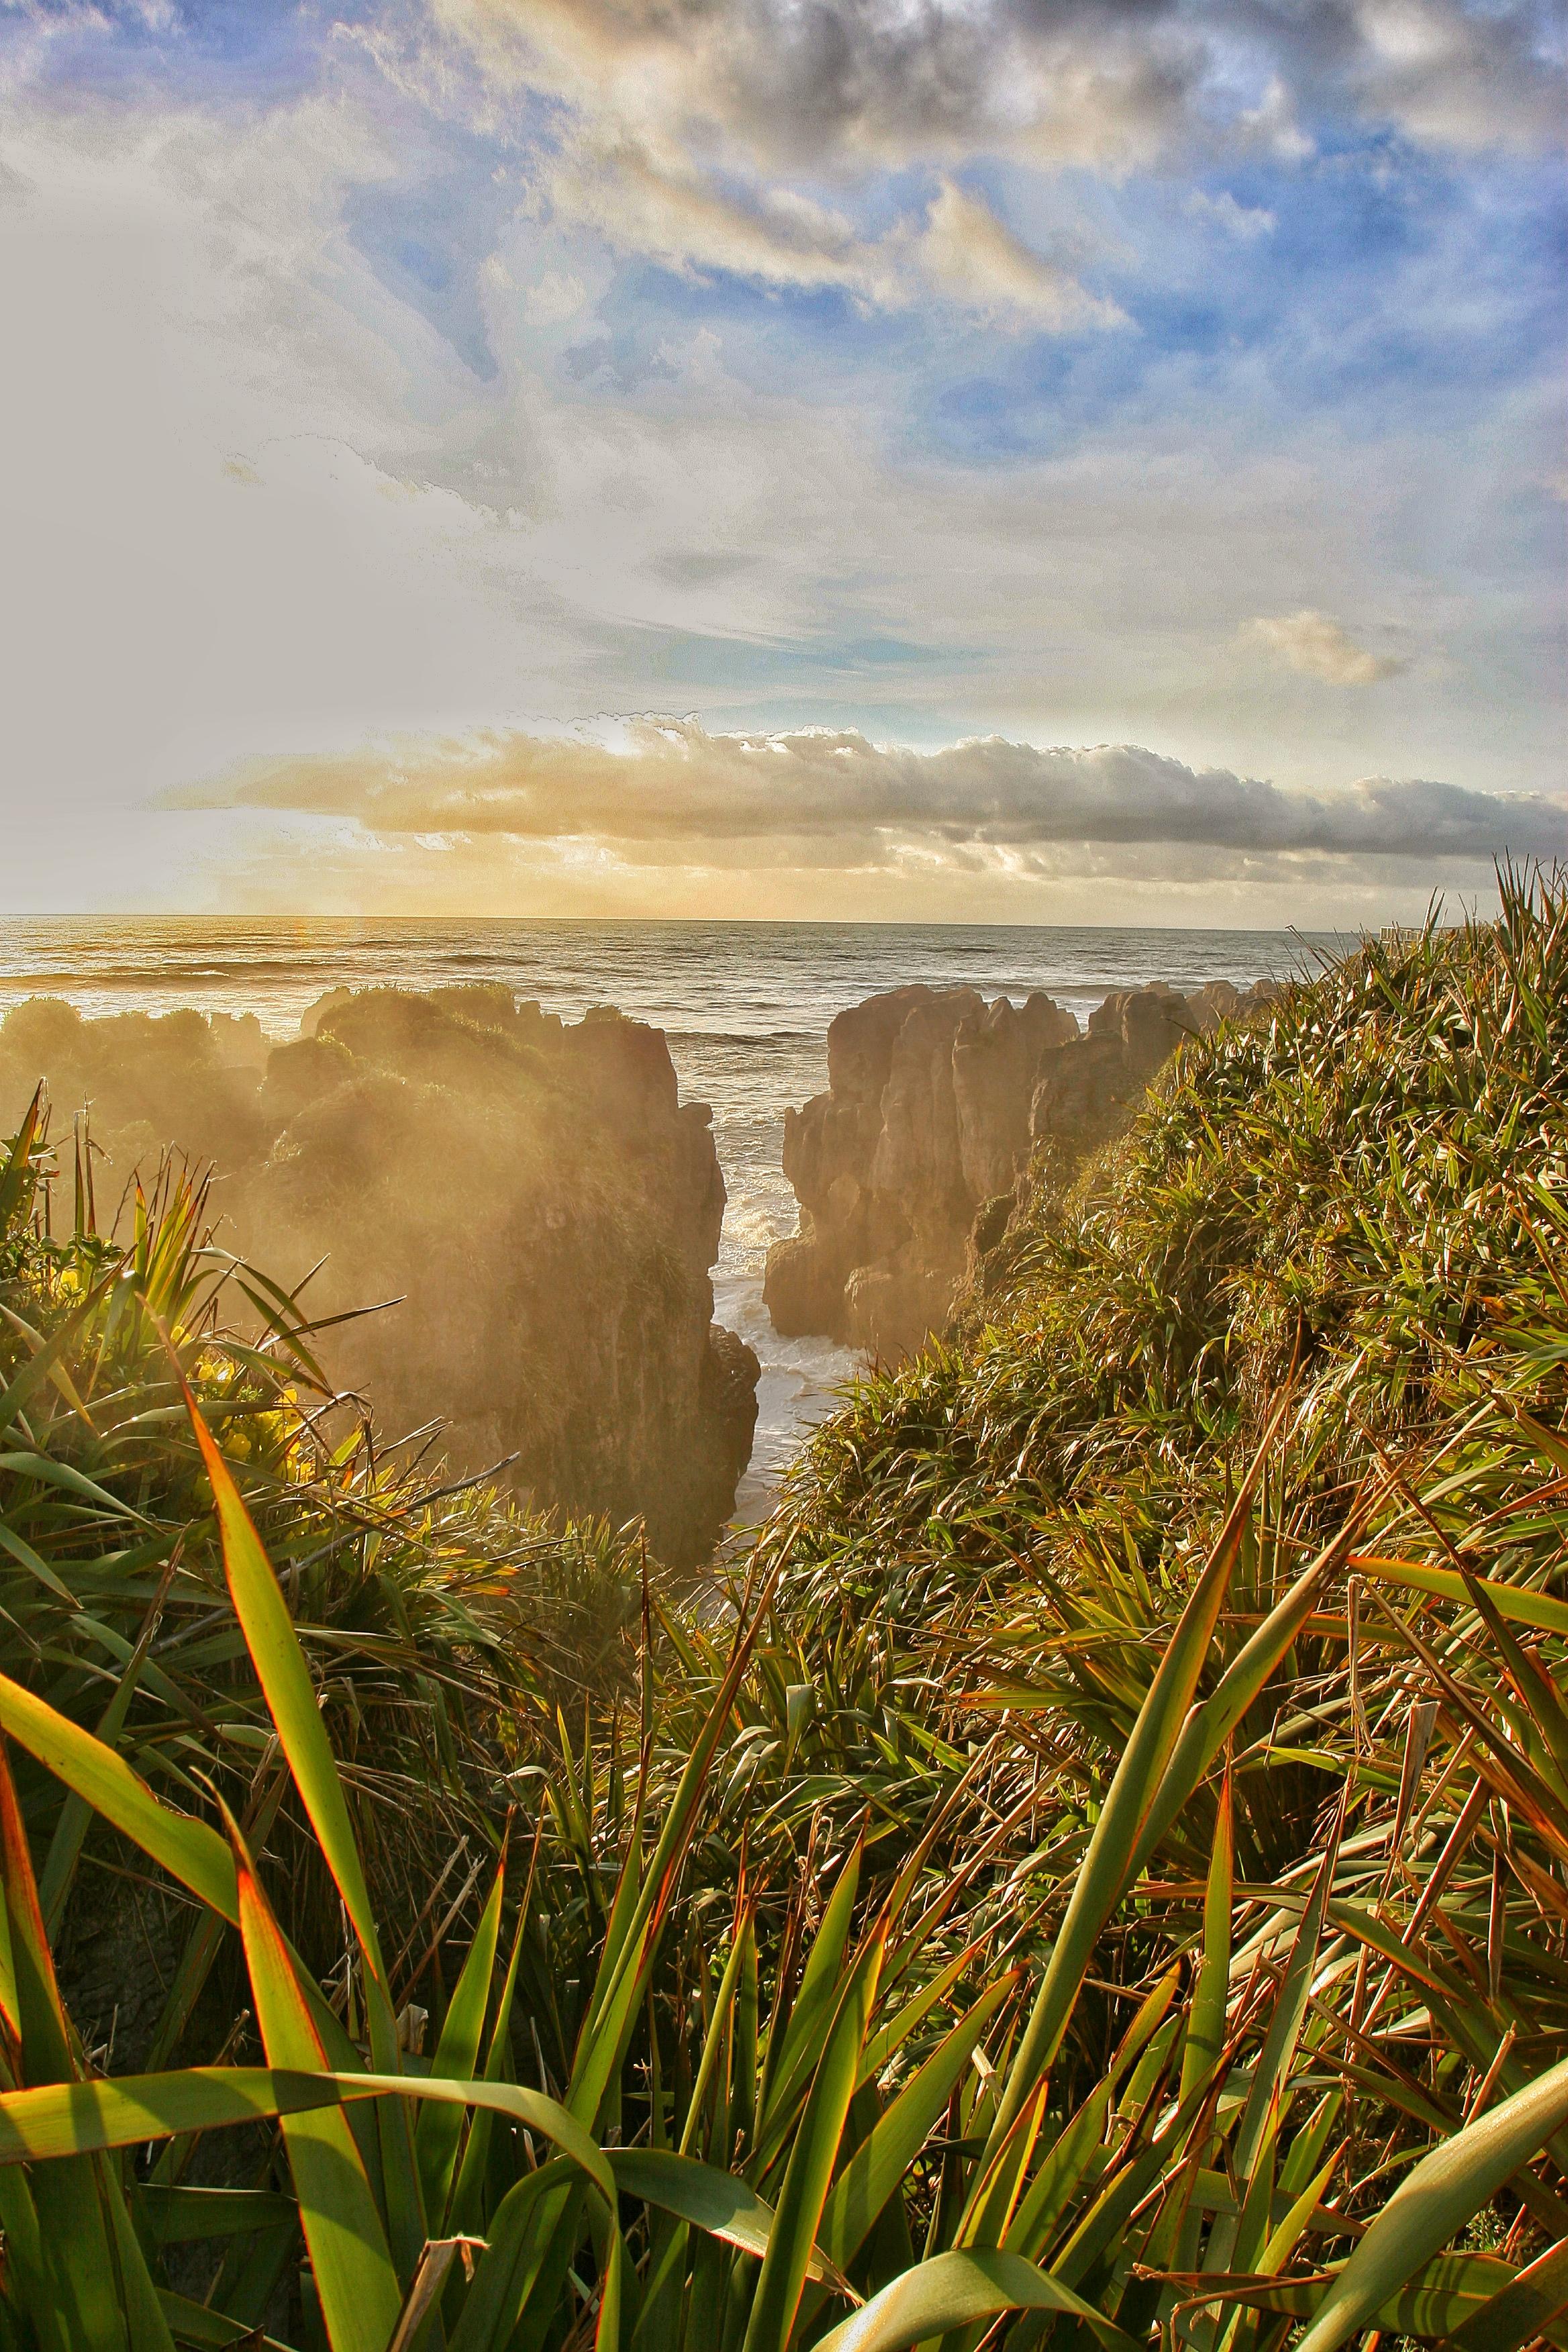 The Pancake Rocks are a coastal limestone feature within Paparoa National Park